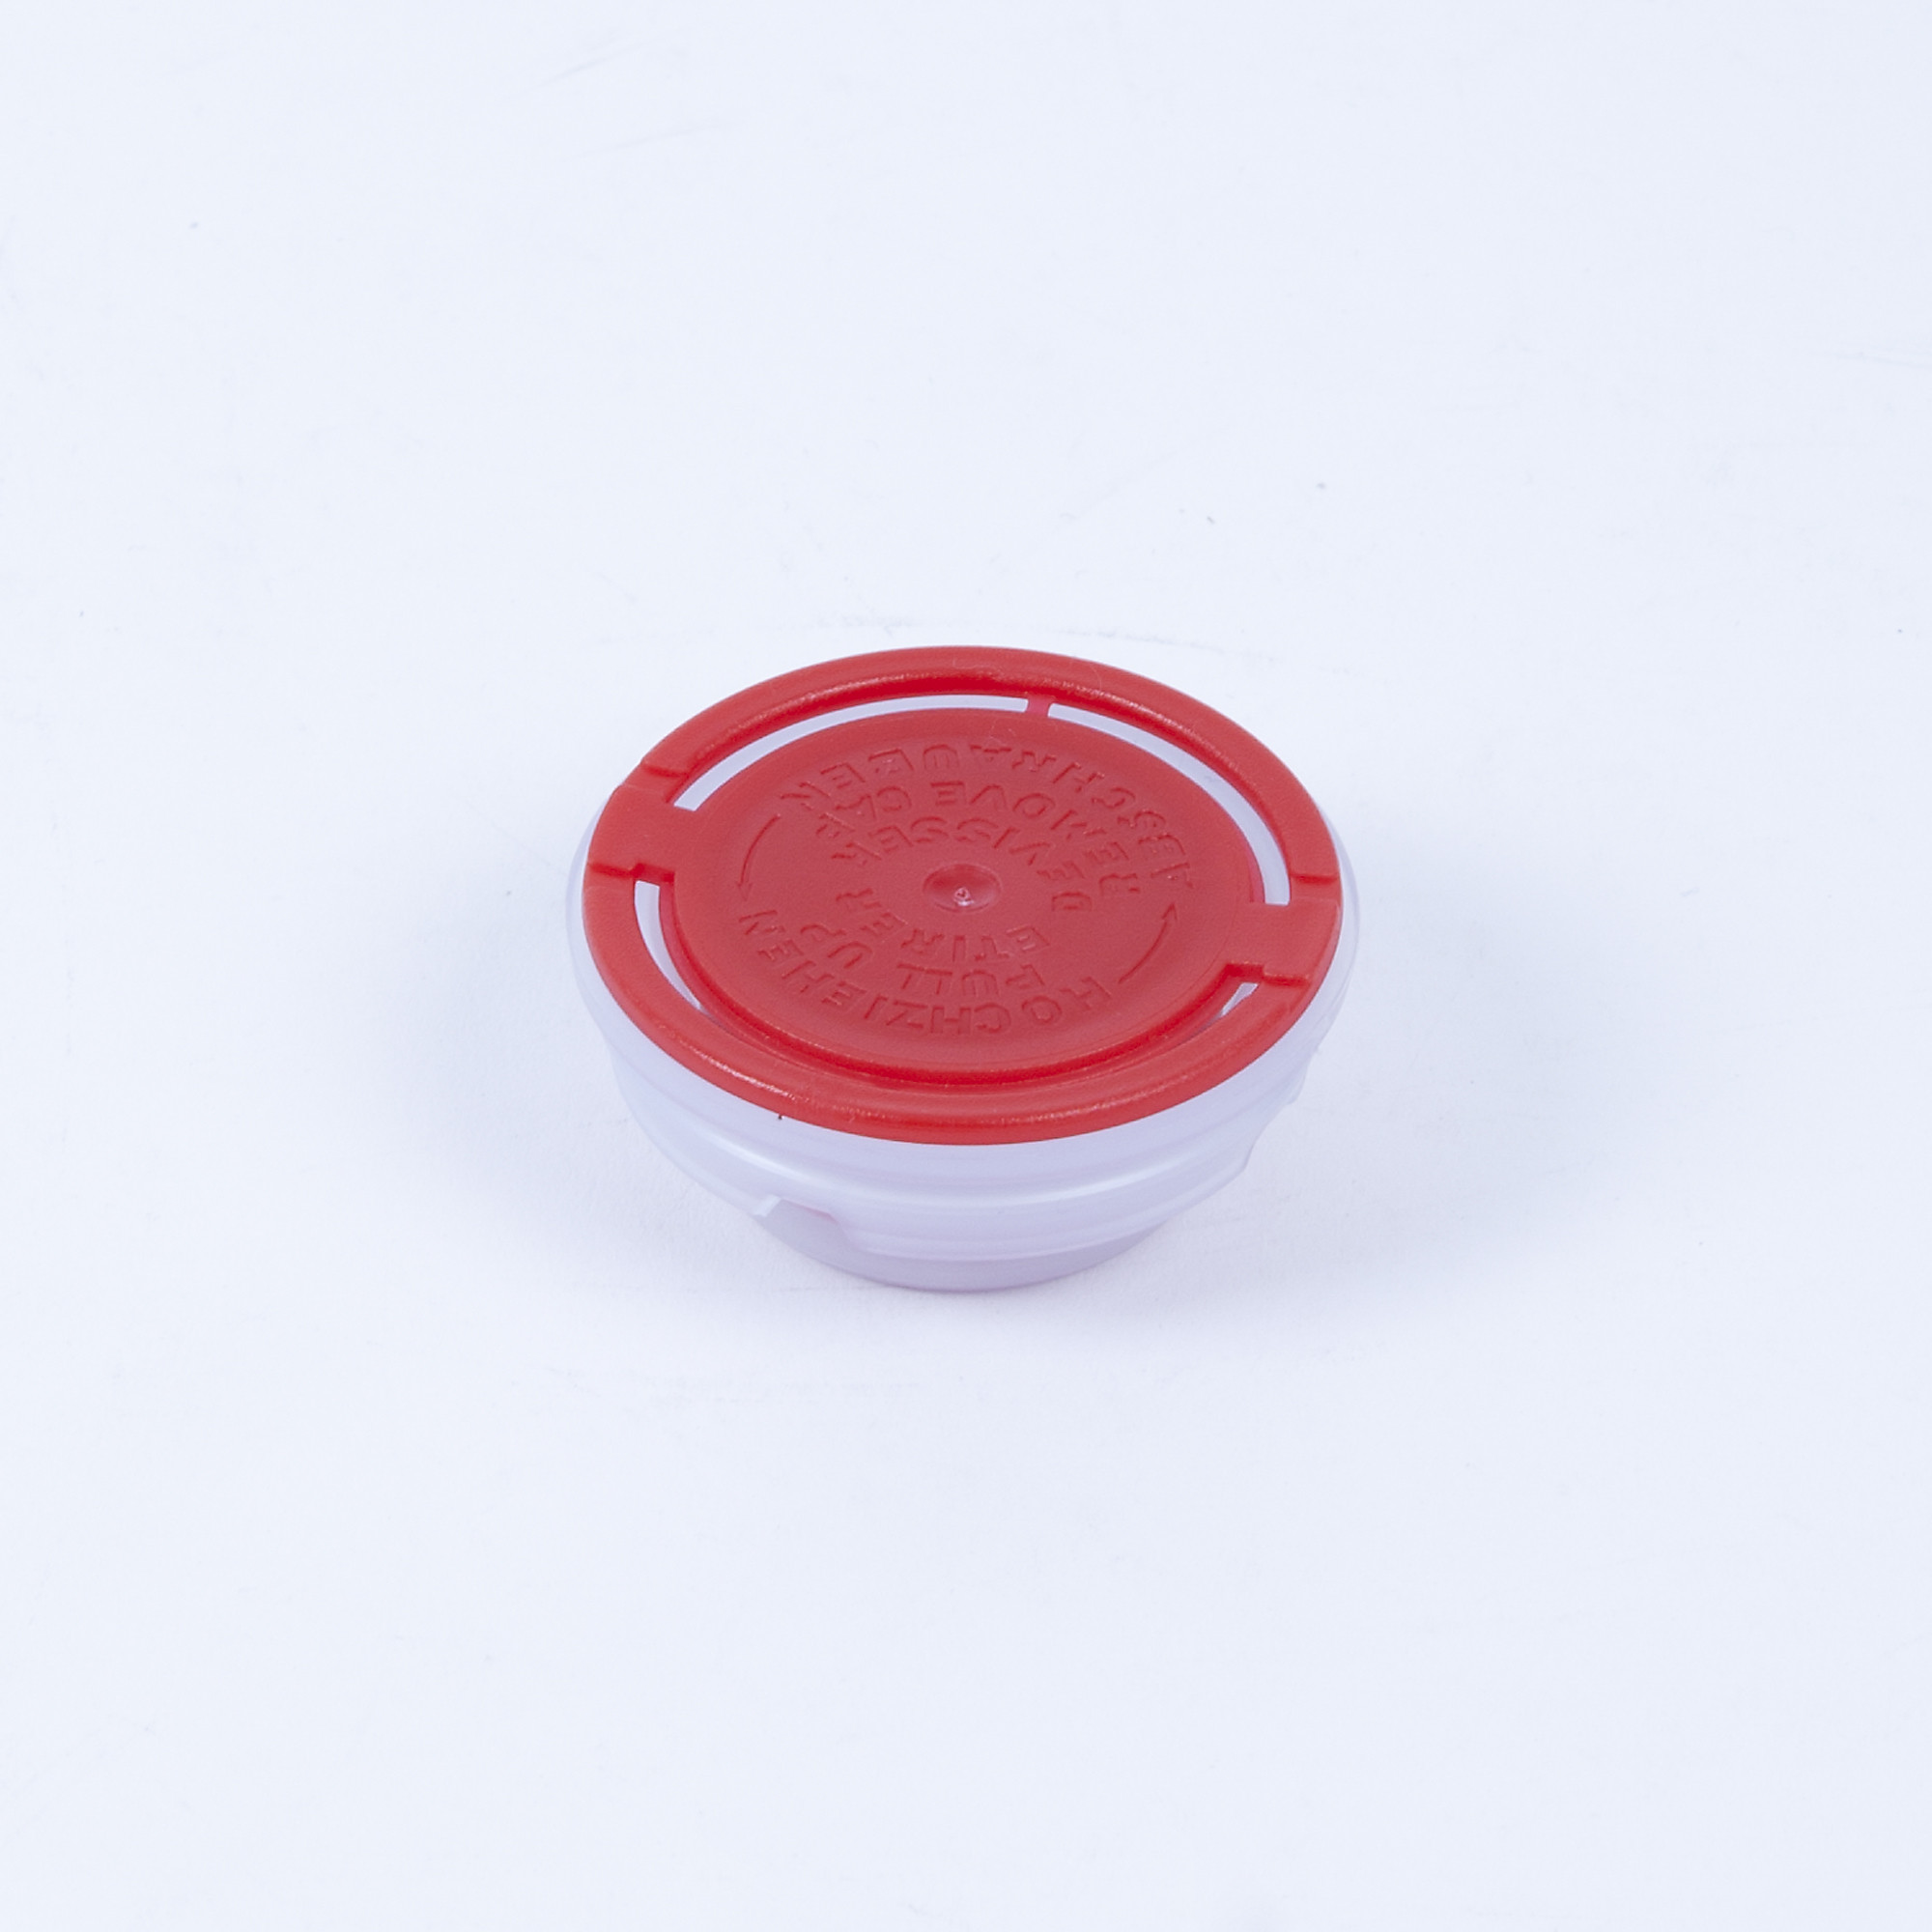 Kunststoff-Faltenbalgverschluss rot 32mm, bestrahlt